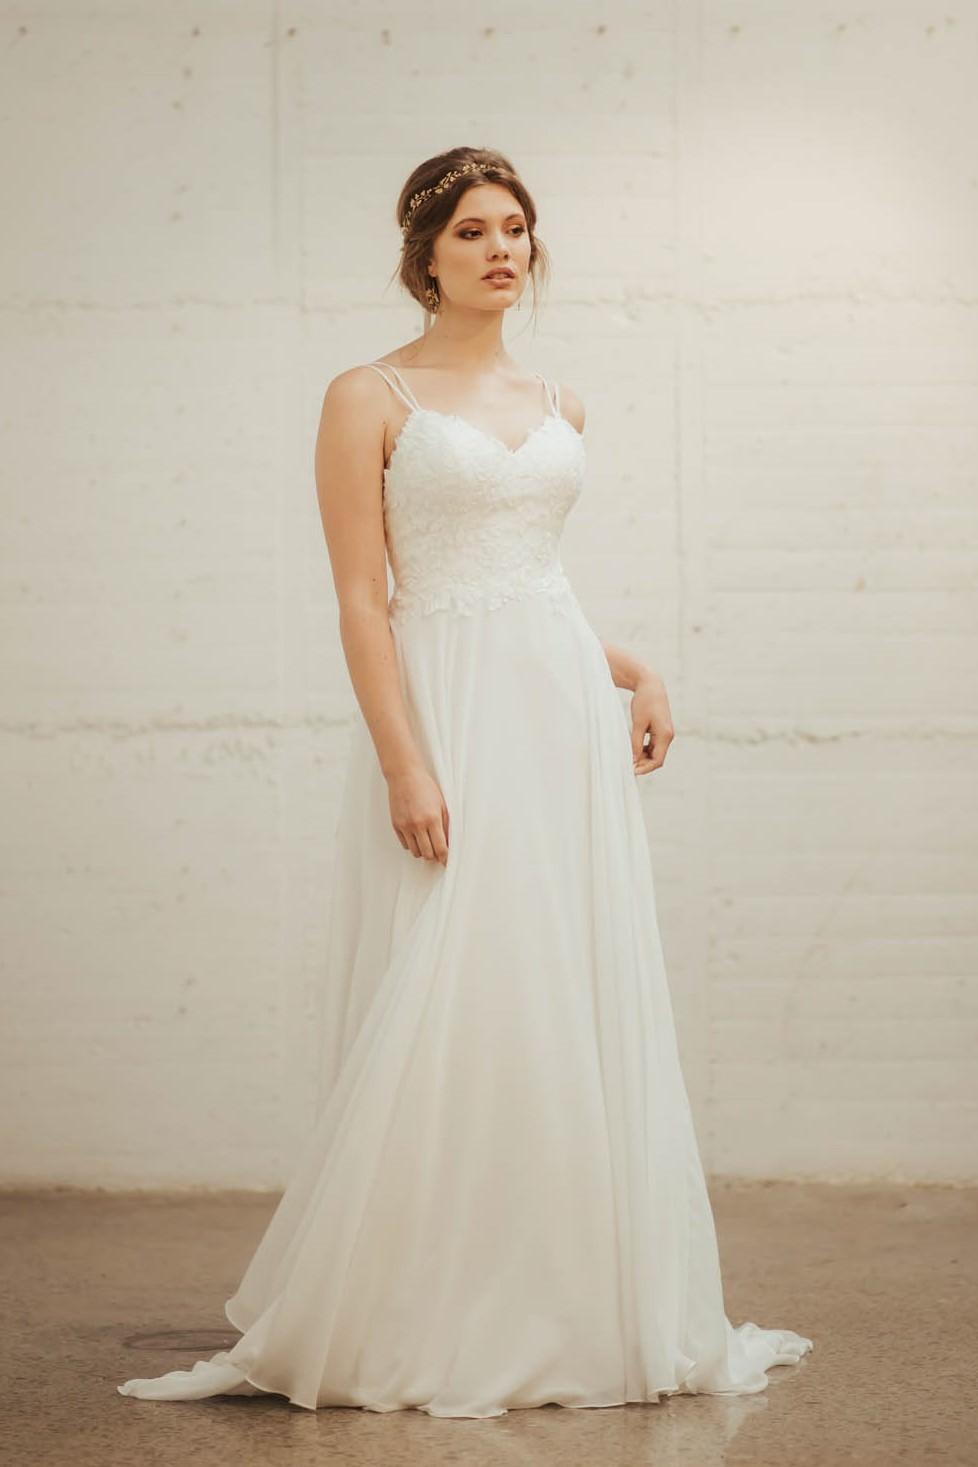 Lainee Hermsen Poppy Wedding Dress Collection - Paperswan Bride - Wedding Dress Shop - Wellington - Christchurch - New Zealand - Bridal Gowns - NZ